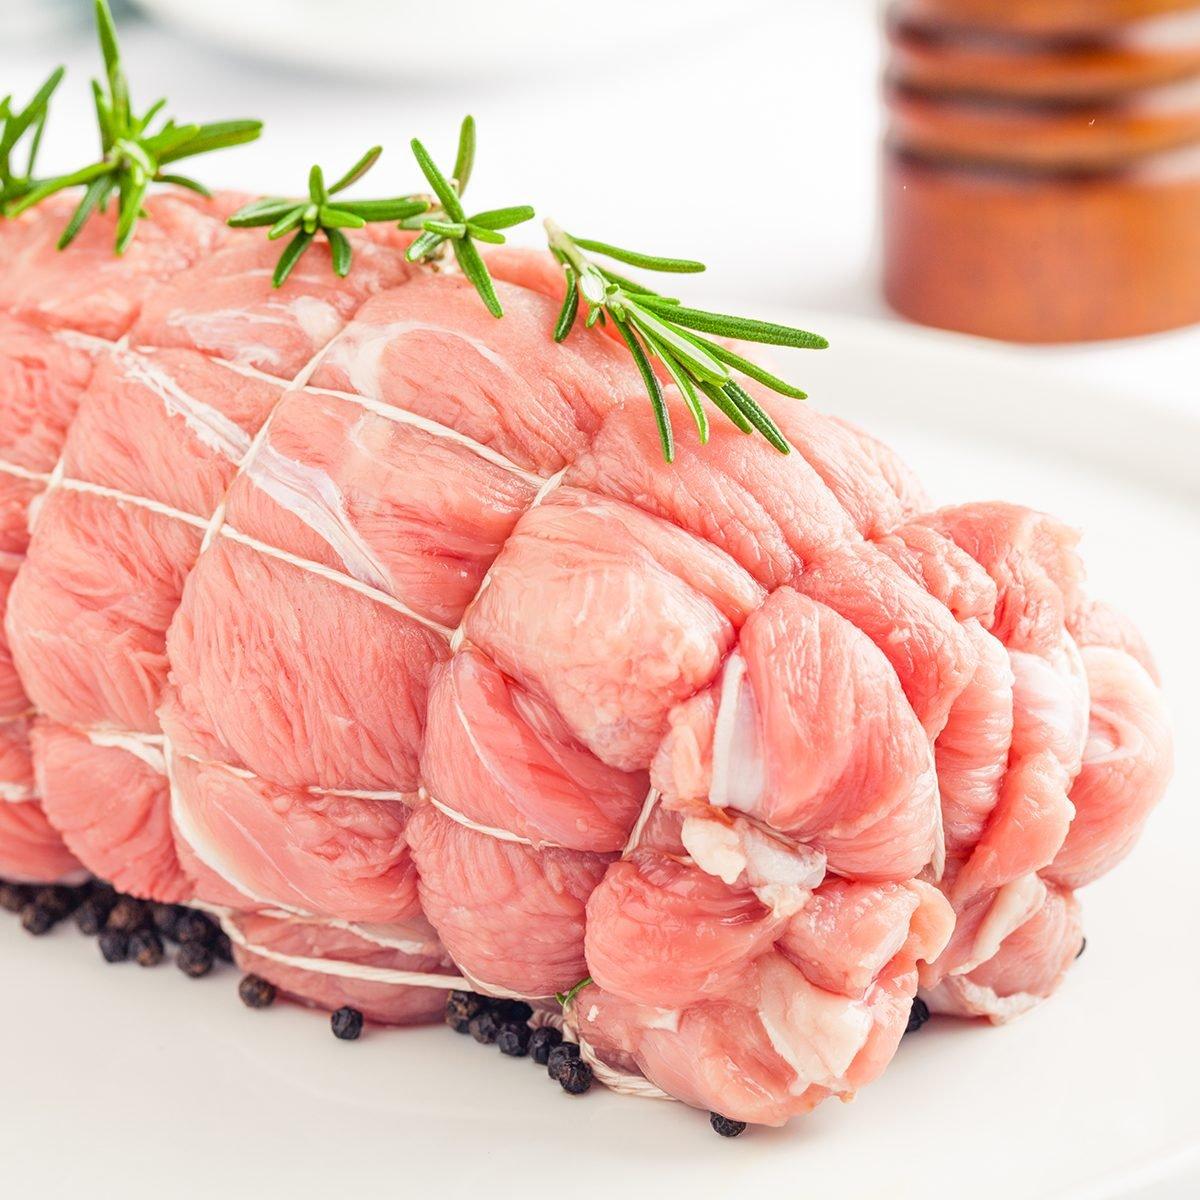 Fresh Roast of Pork